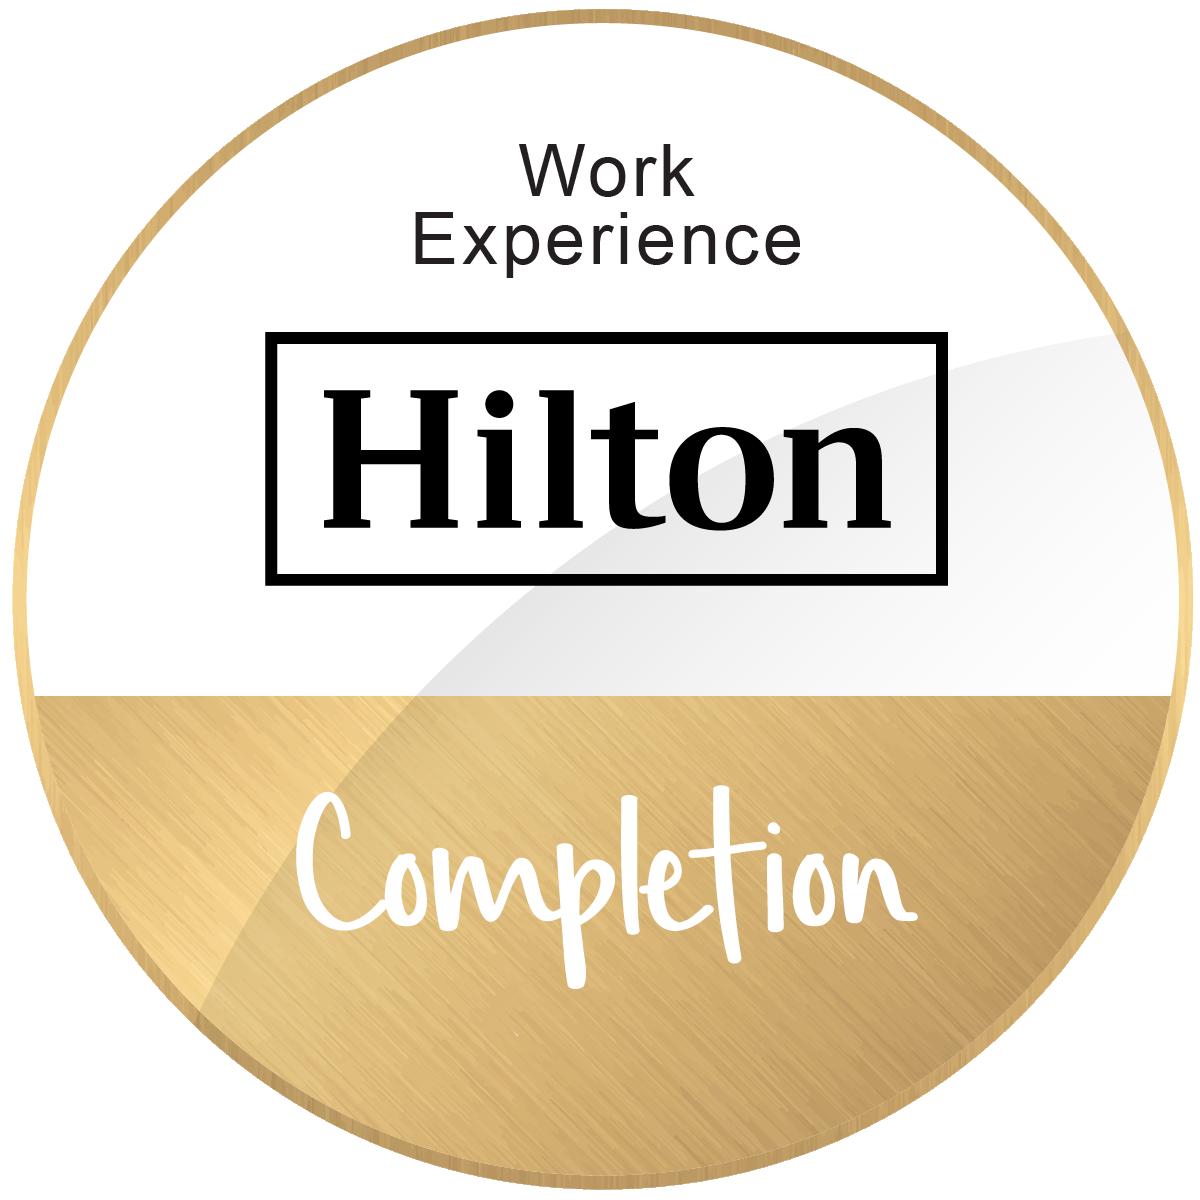 Hilton Global Work Experience